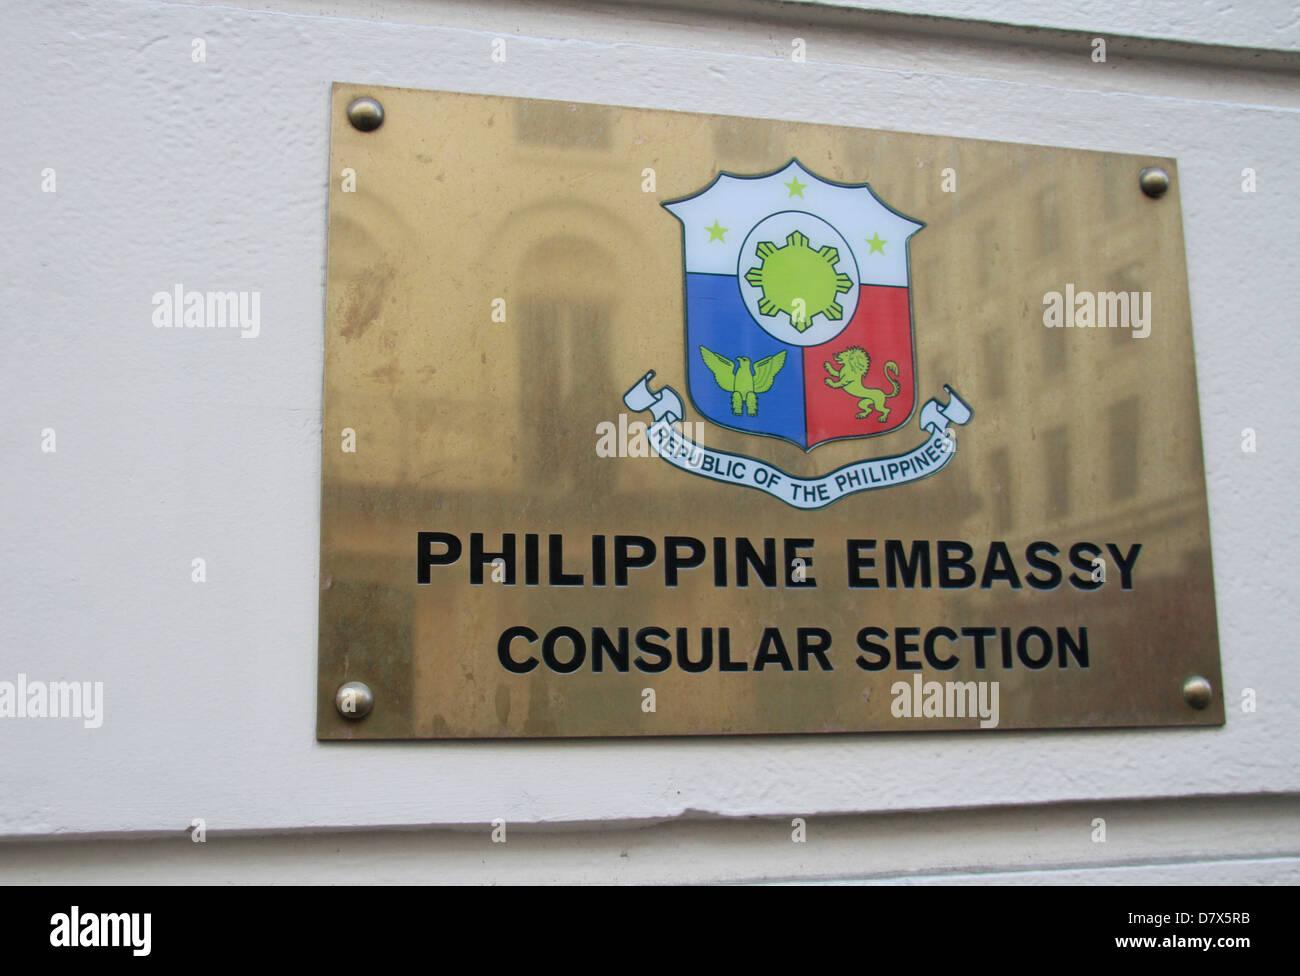 Philippine Embassy, London